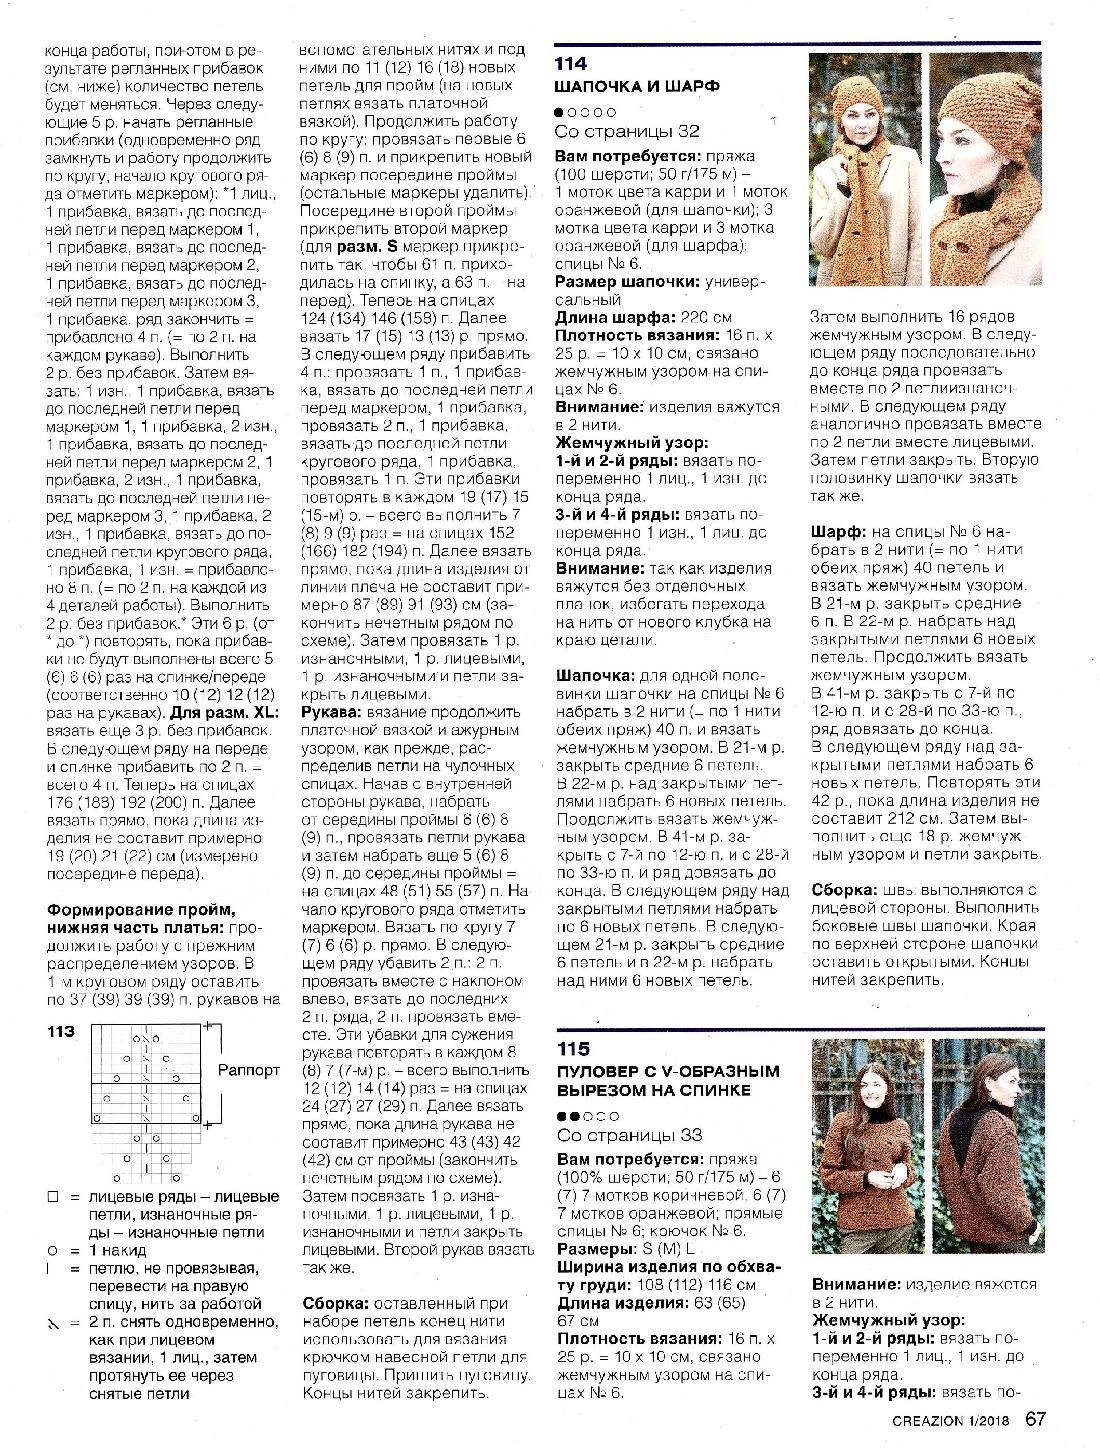 Page_00067.jpg